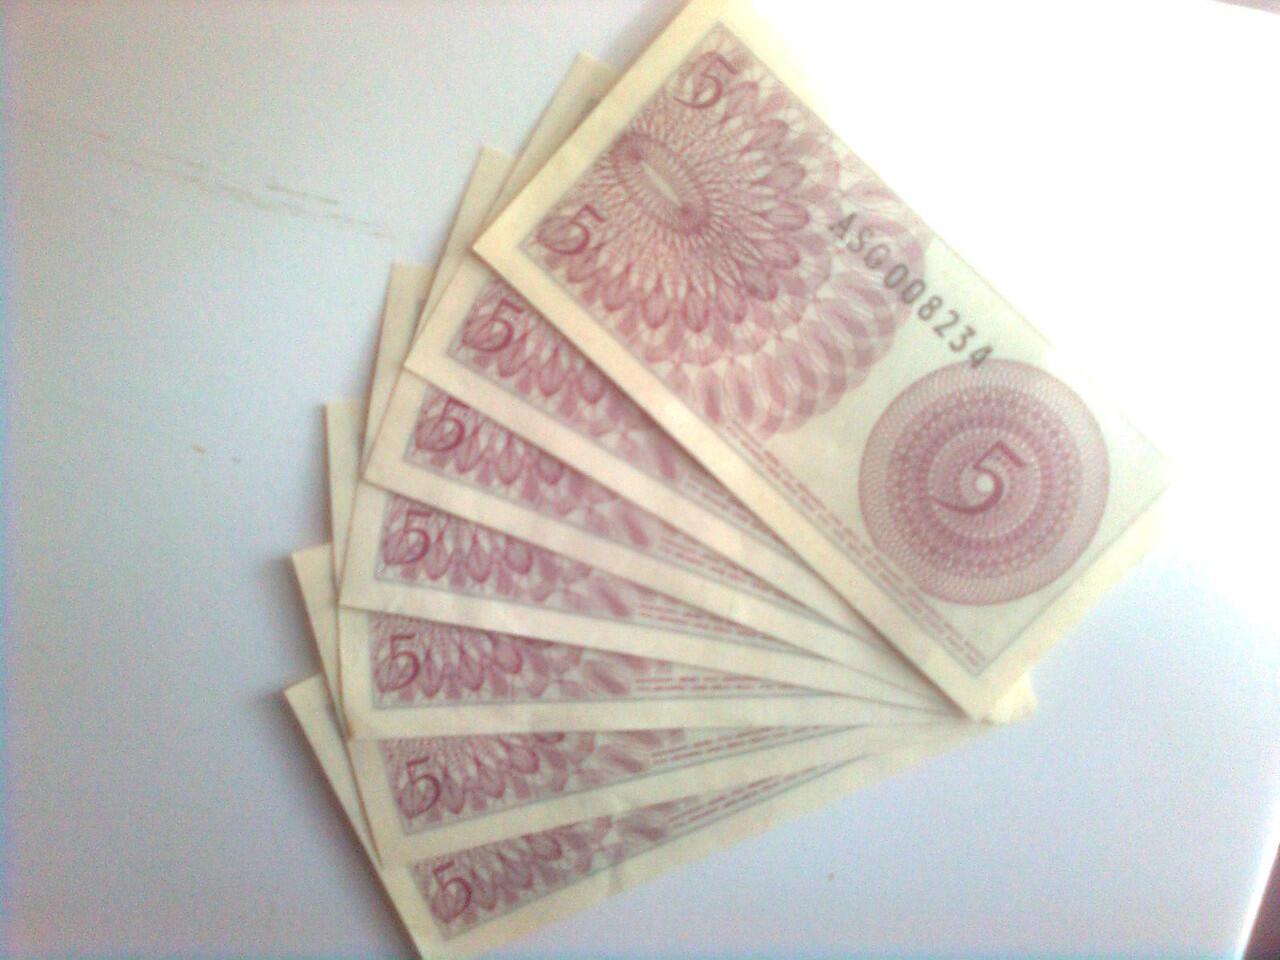 uang kuno 5 sen tahun 1964